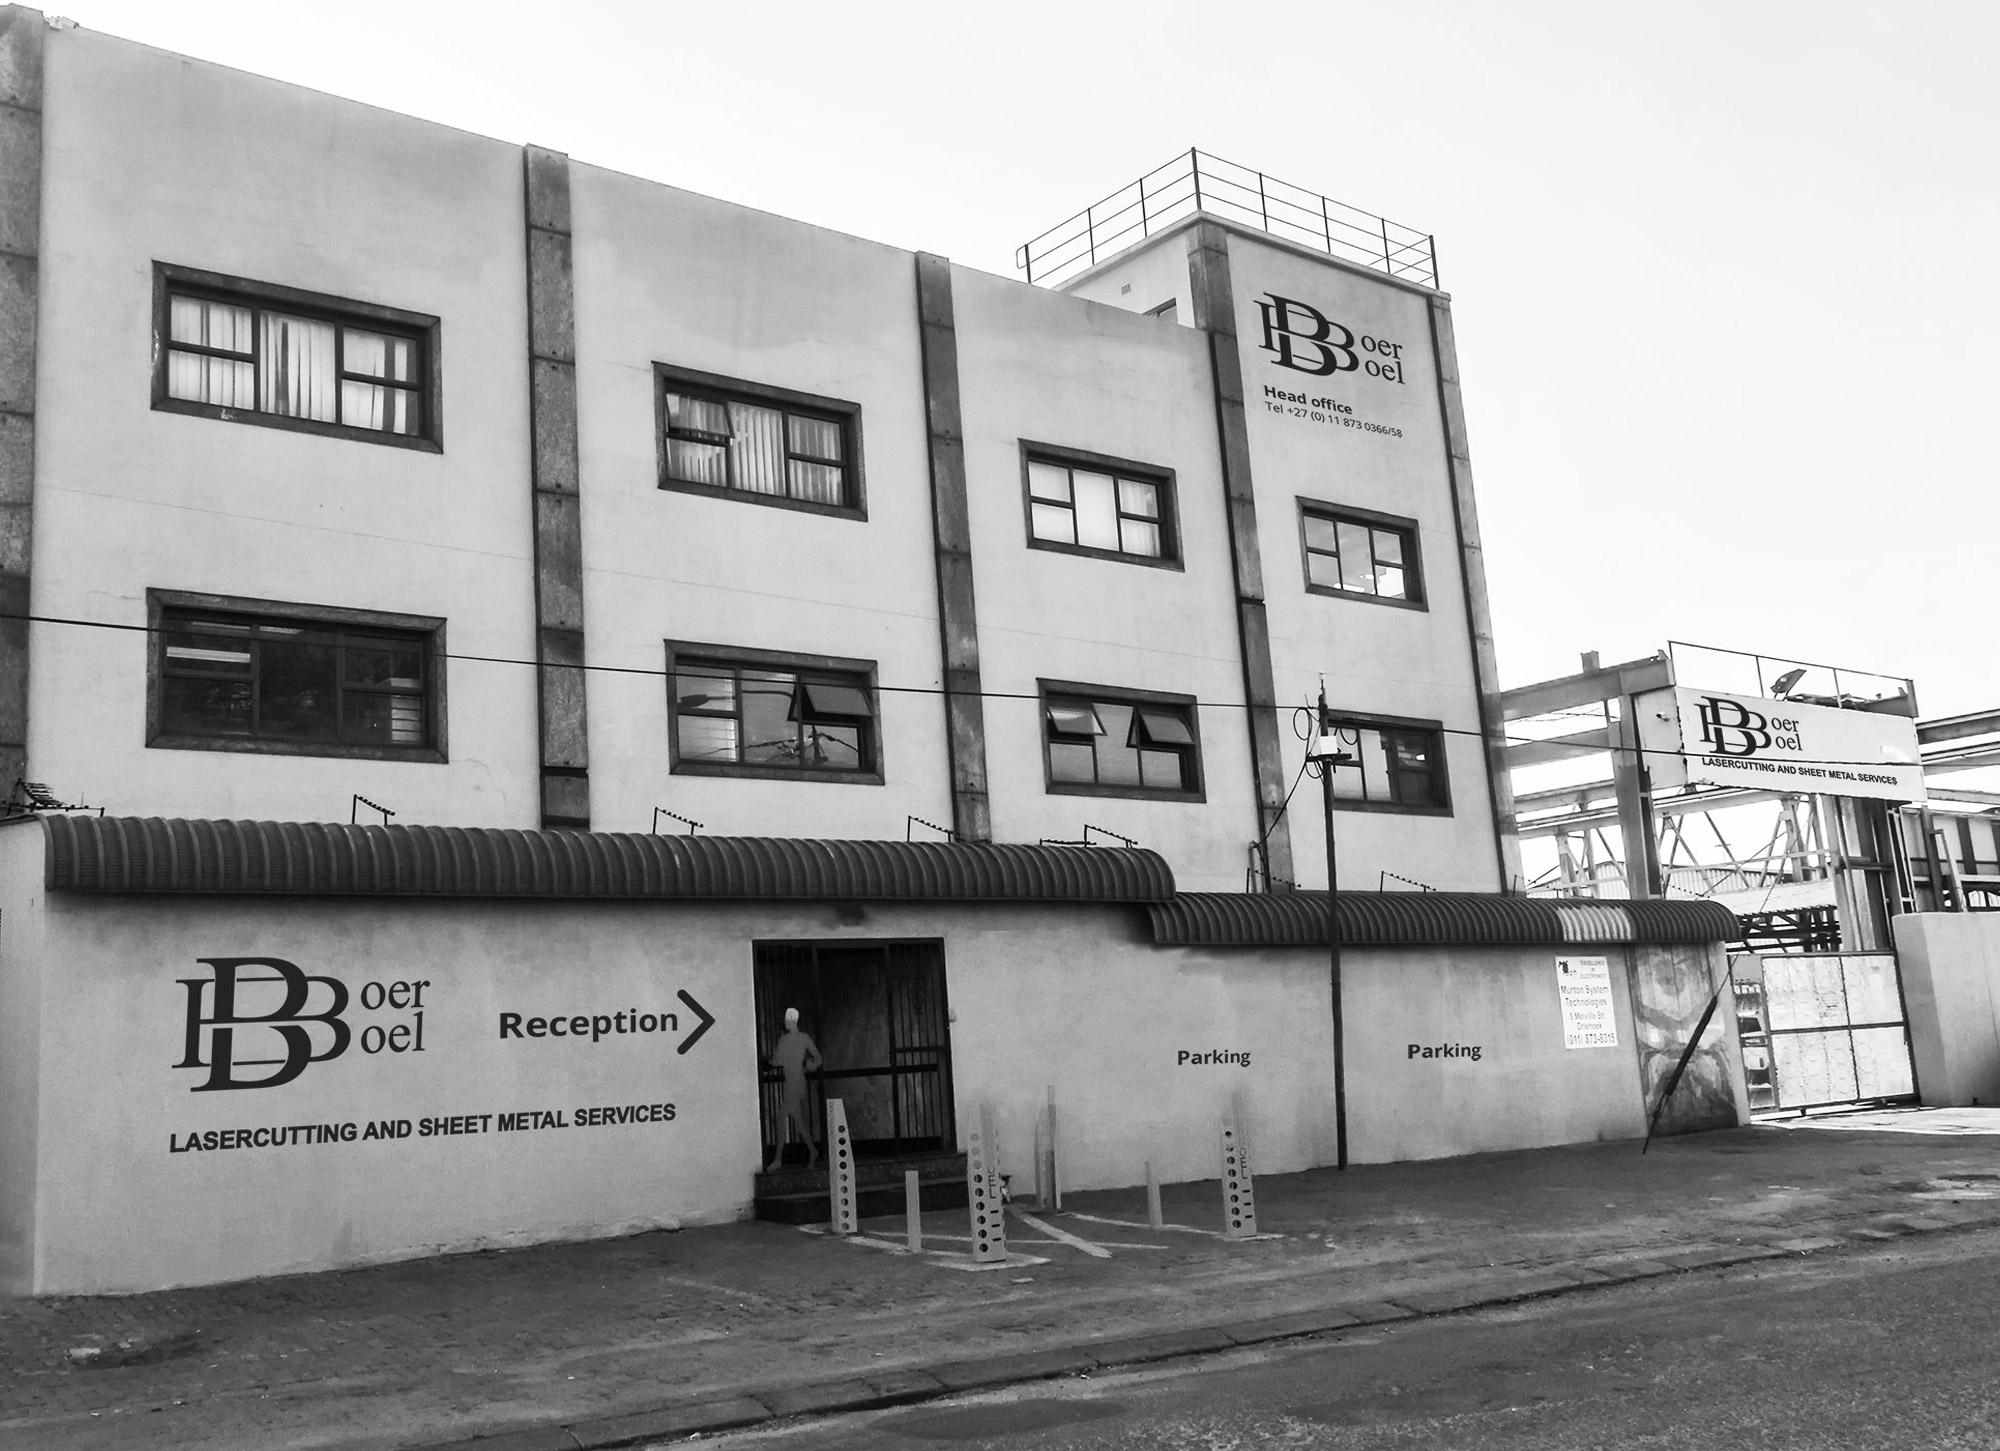 BoerBoel Lasercutting and Sheet Metal Fabrication - Office Building